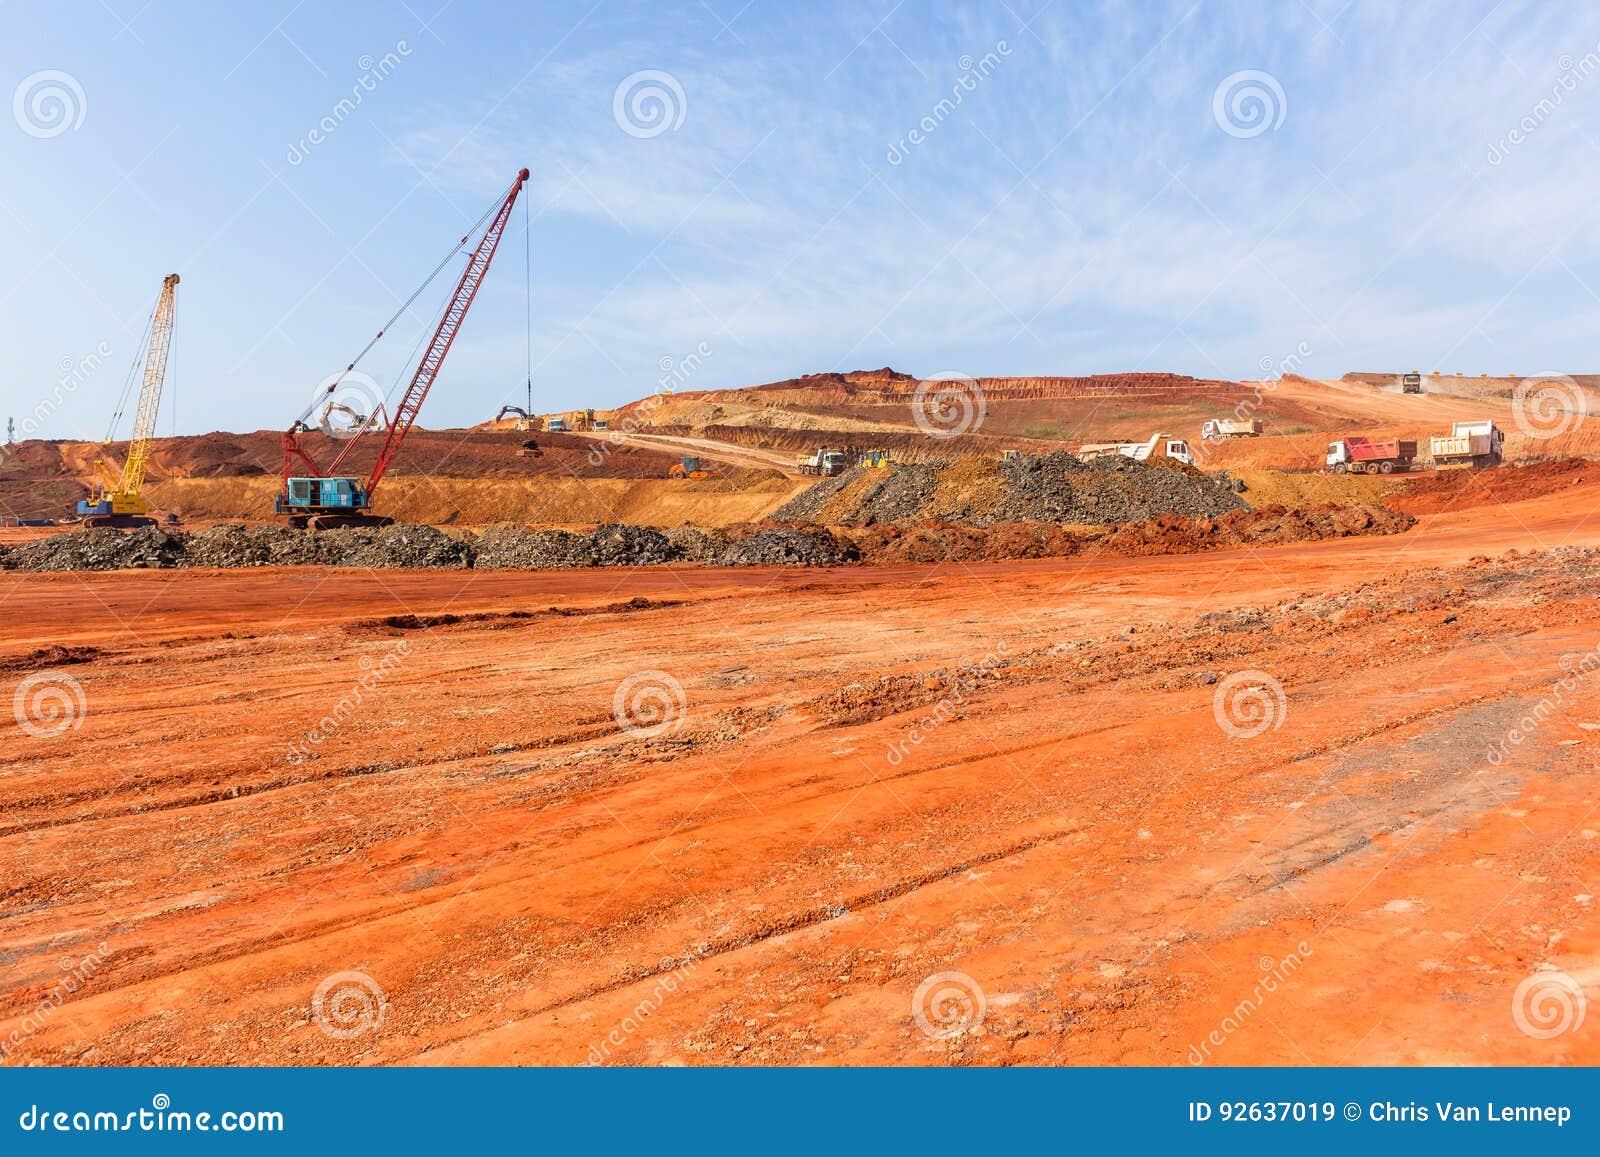 Construction Earthworks Cranes Trucks Landscape